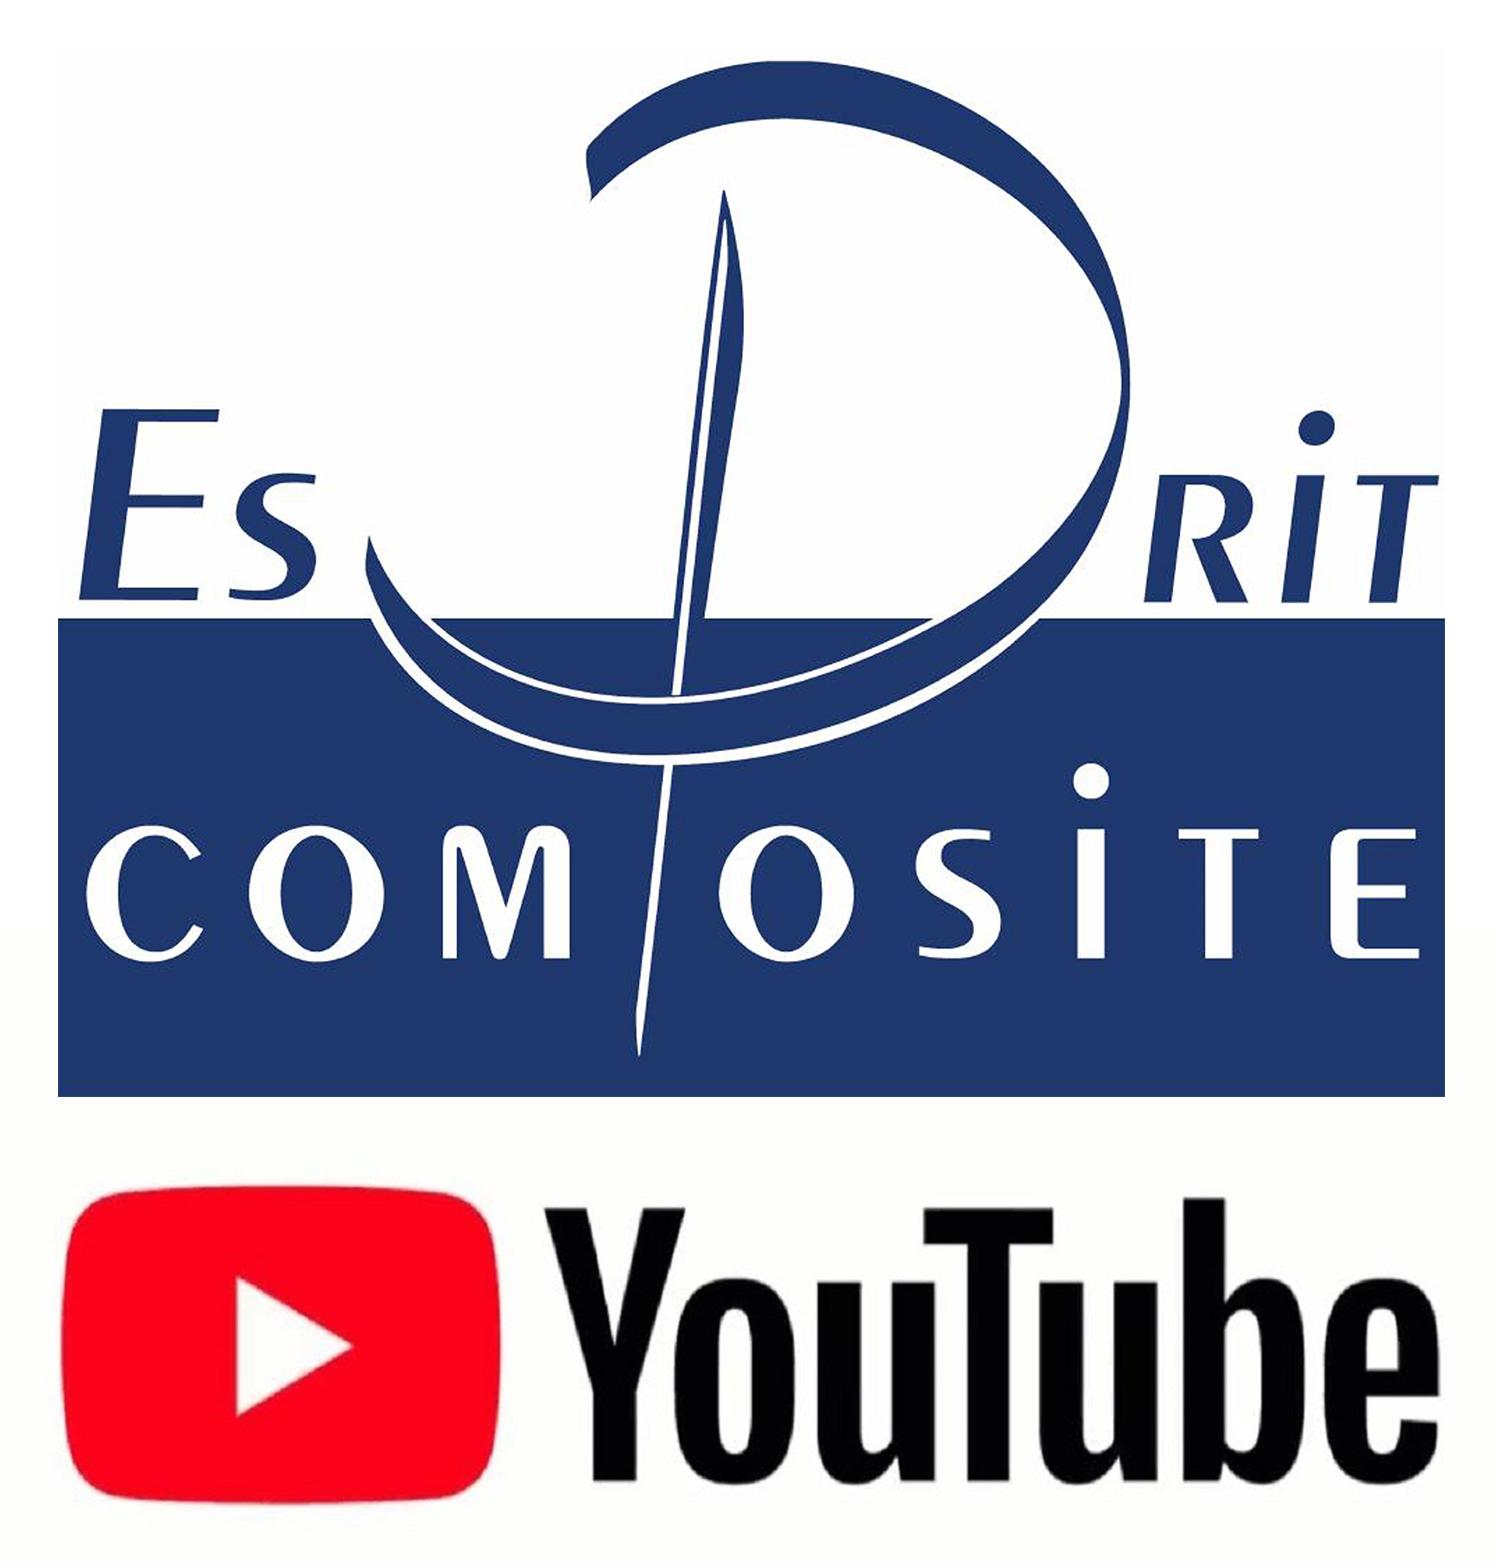 Logo esprit composite chaine youtube